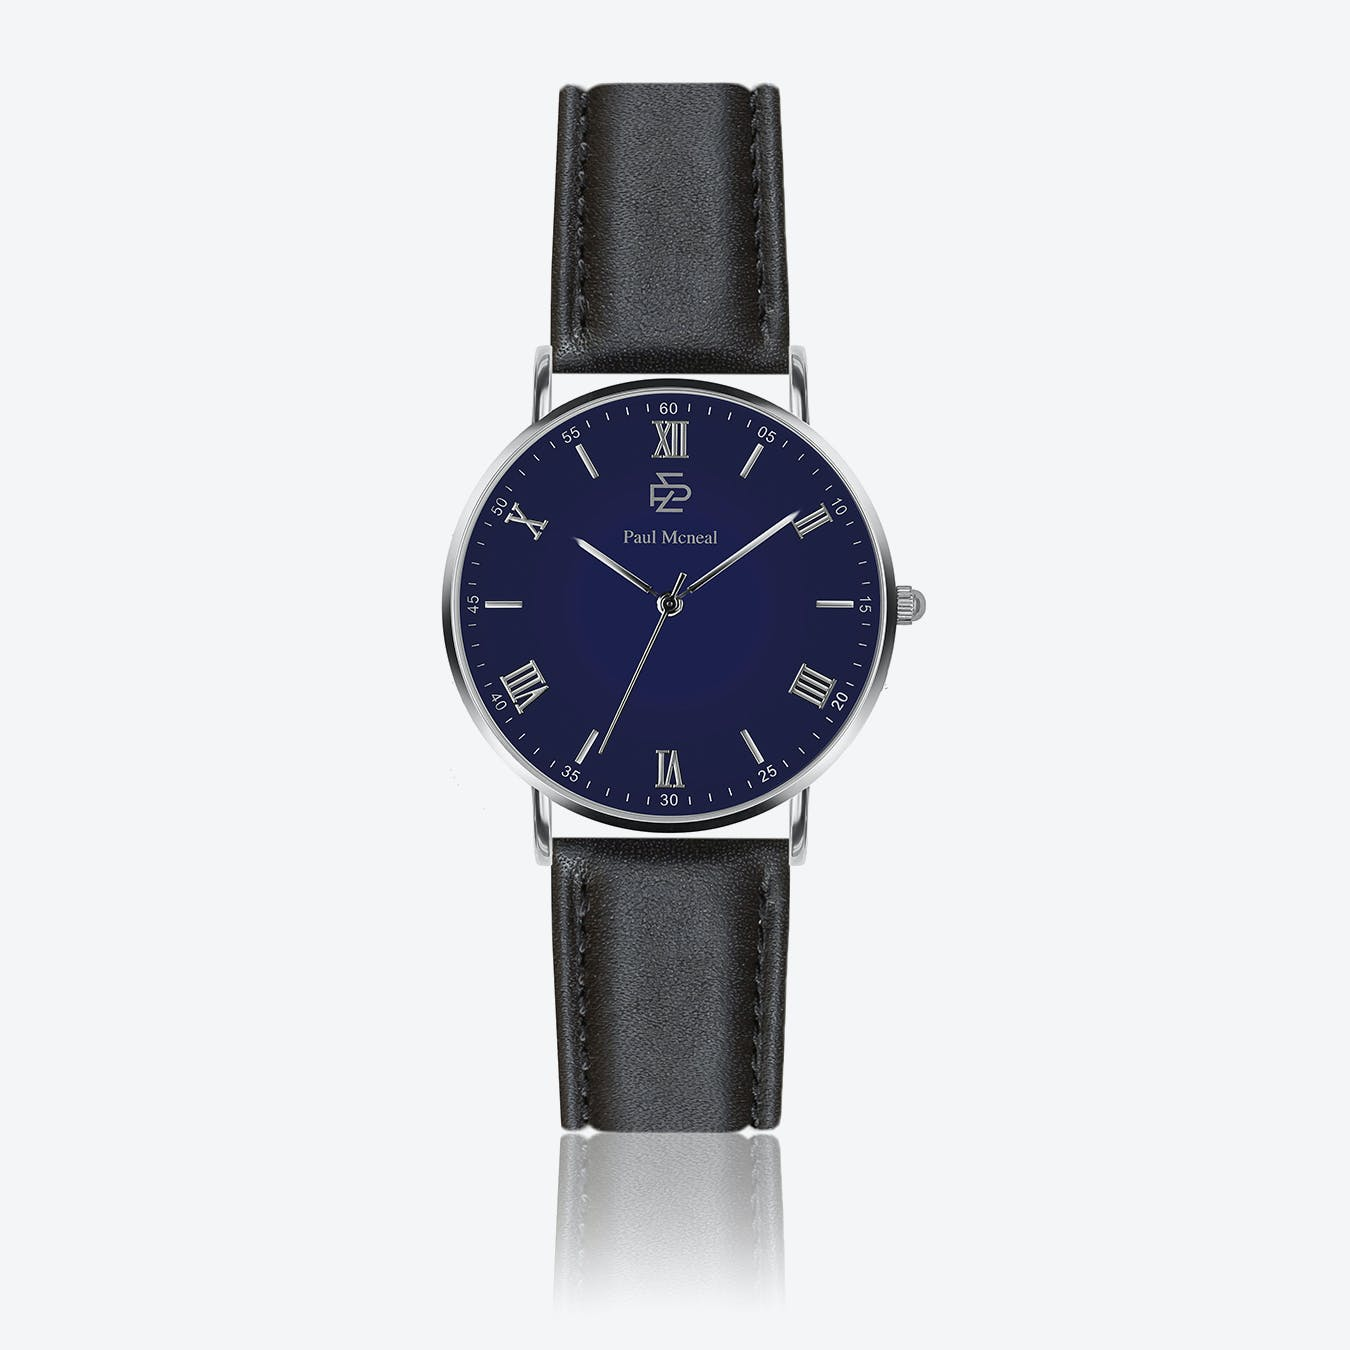 Smooth Black Leather Watch w/ Dark Blue Face - Ø 40 mm